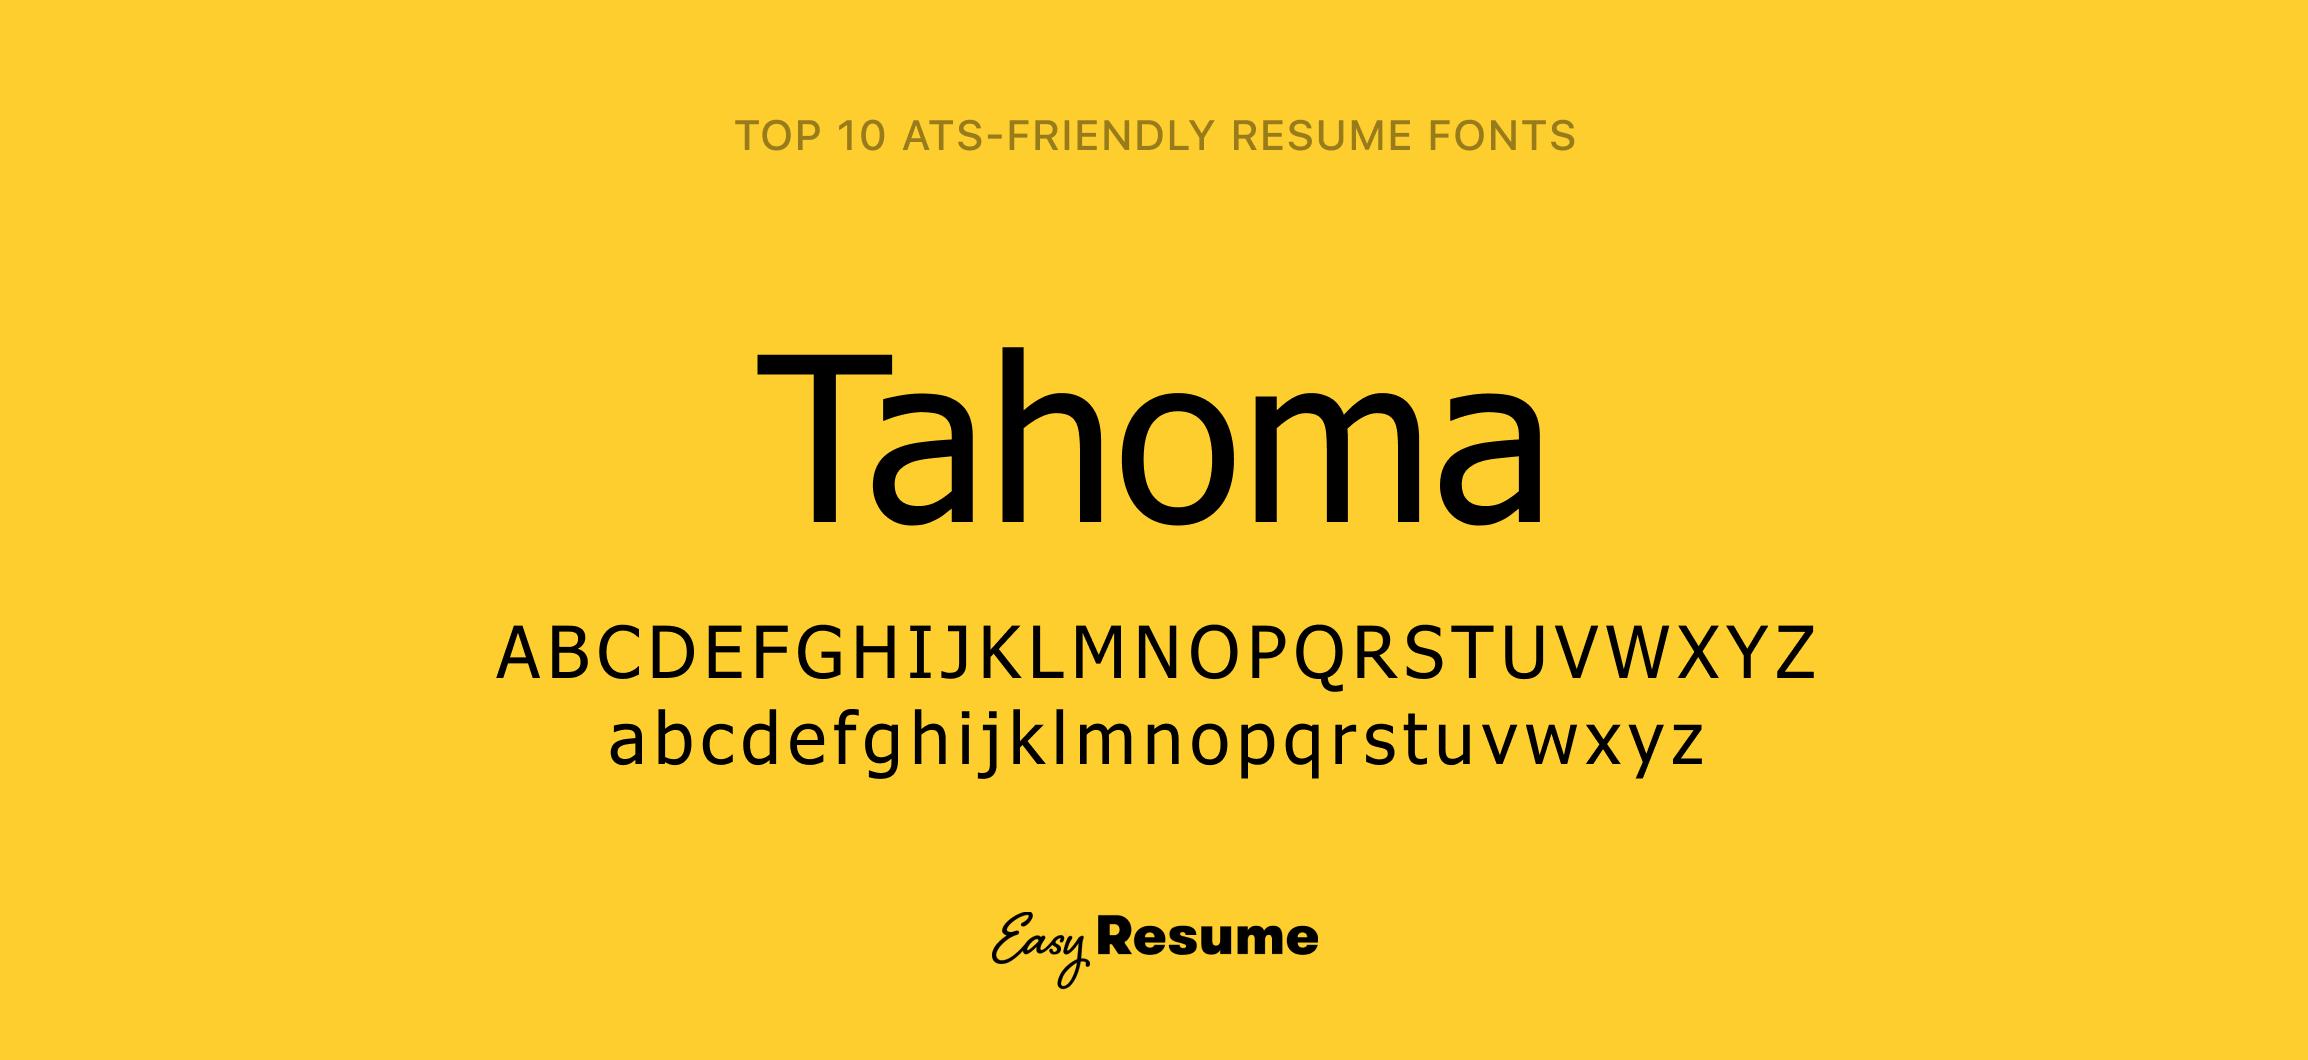 Tahoma Resume Font